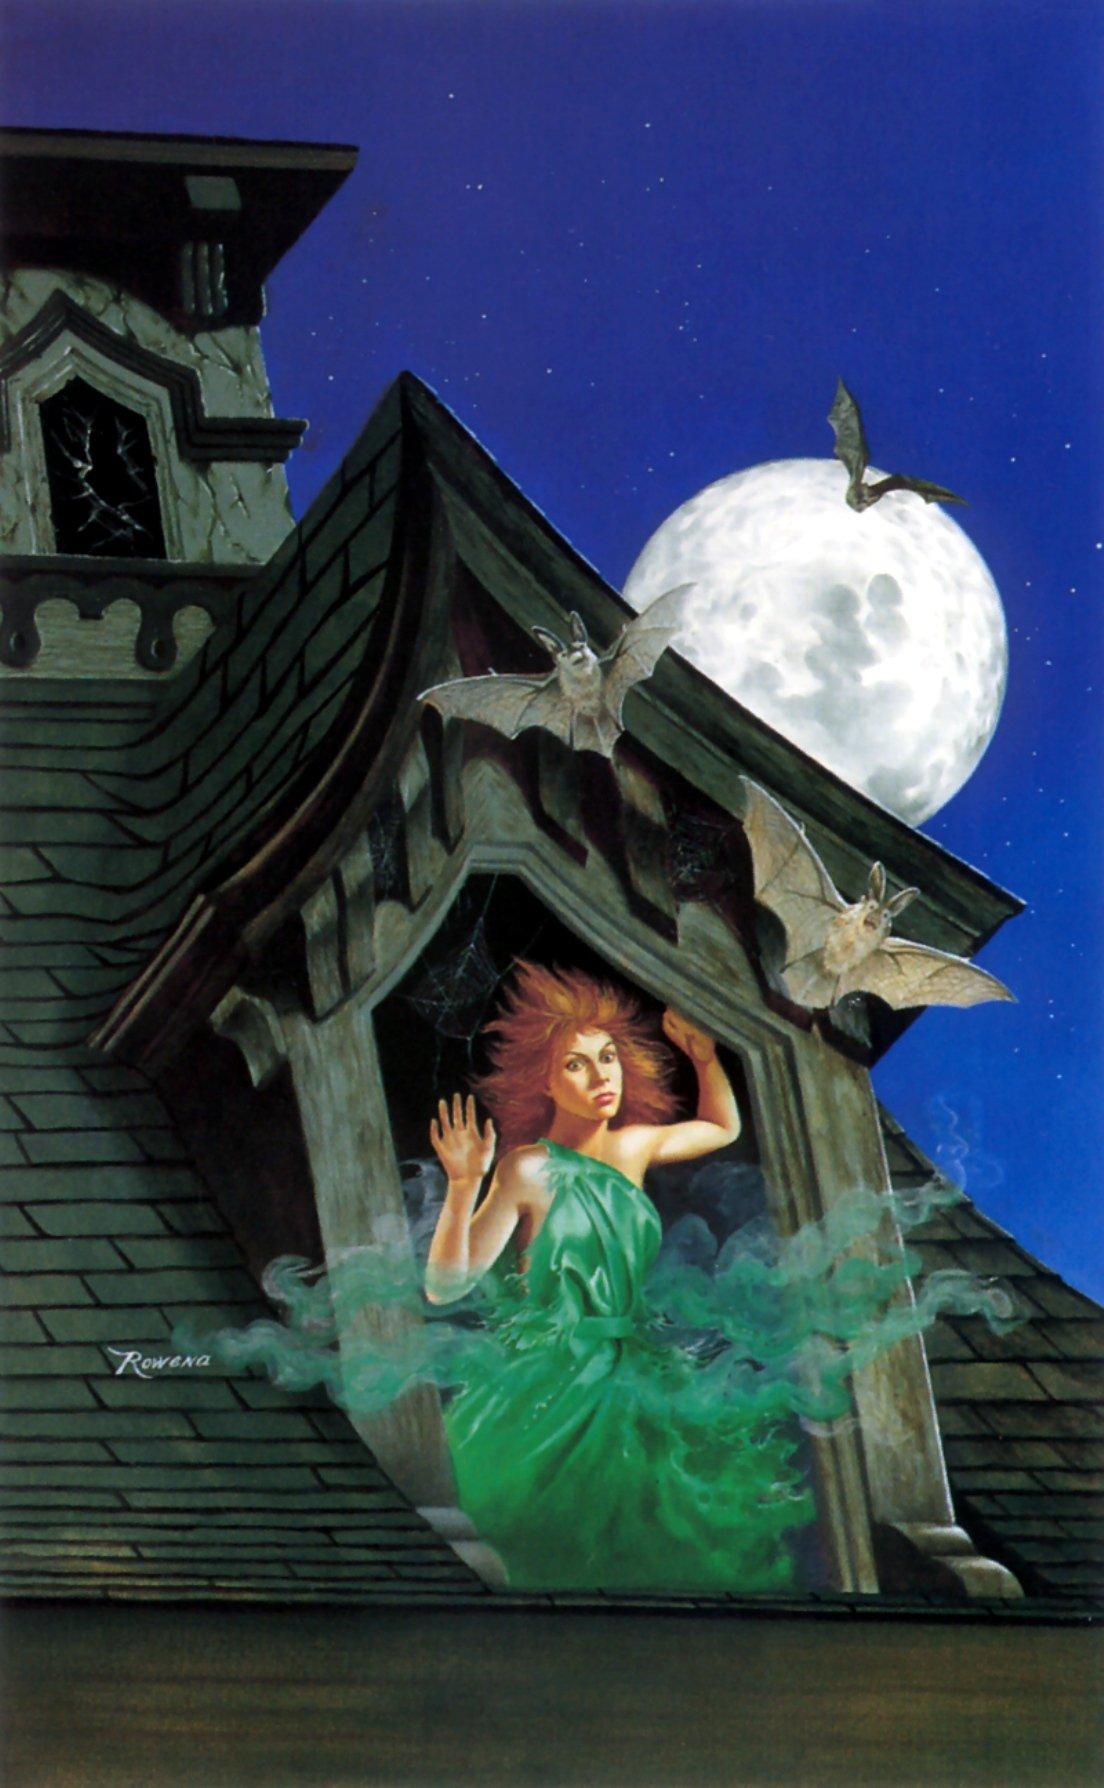 Rowena Morrill The Haunt.